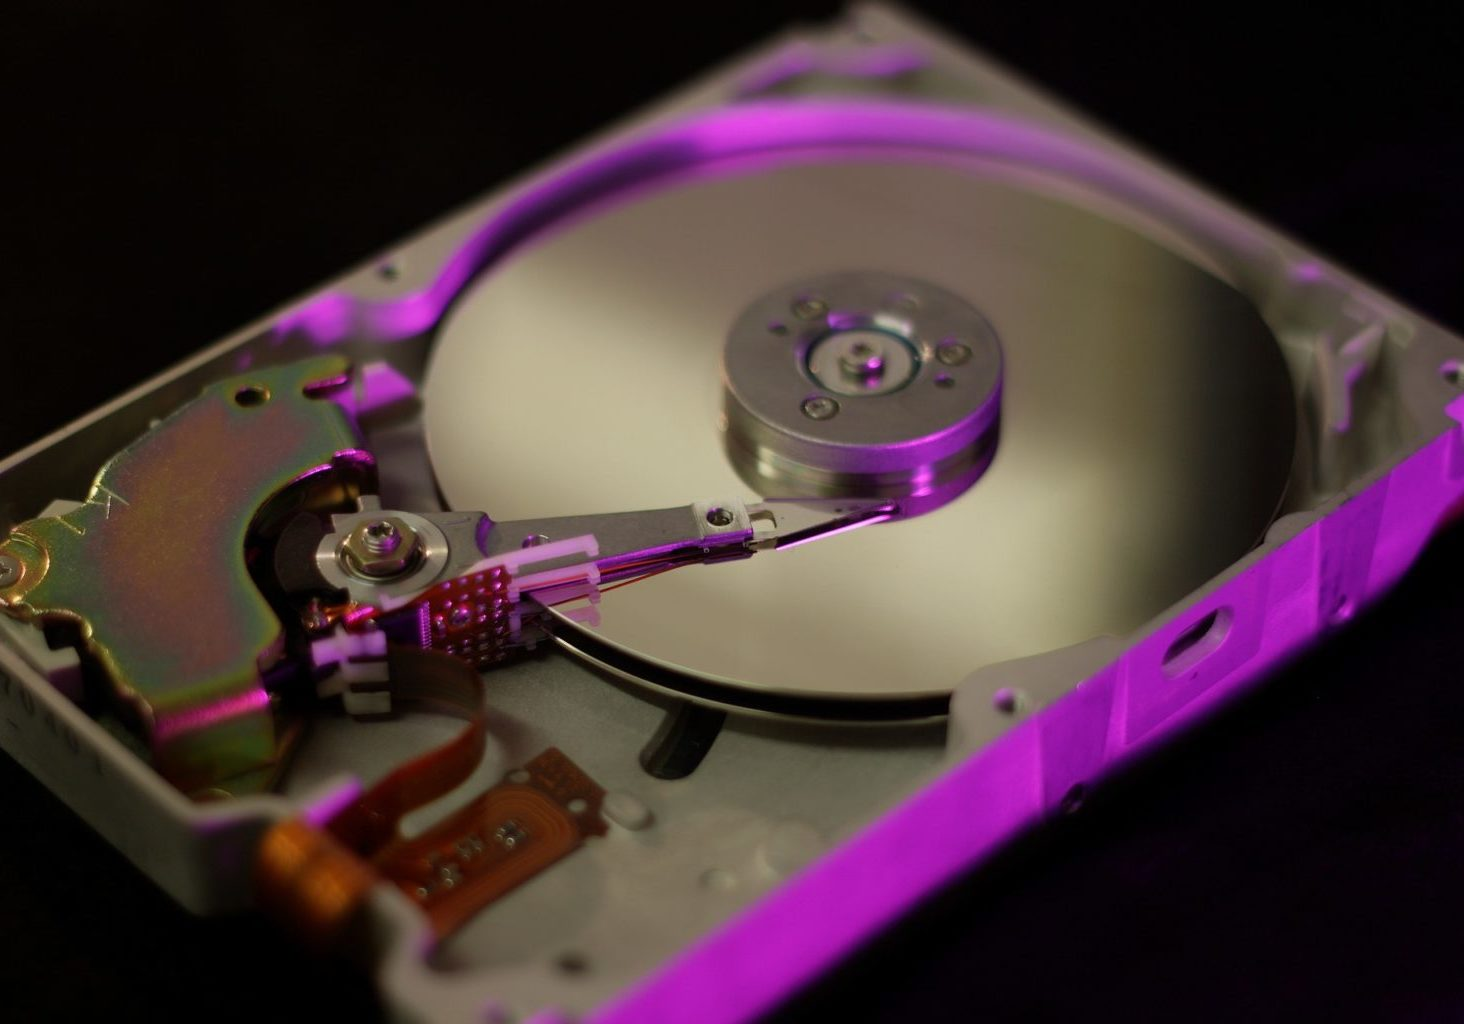 hard-disc-3319335_1920